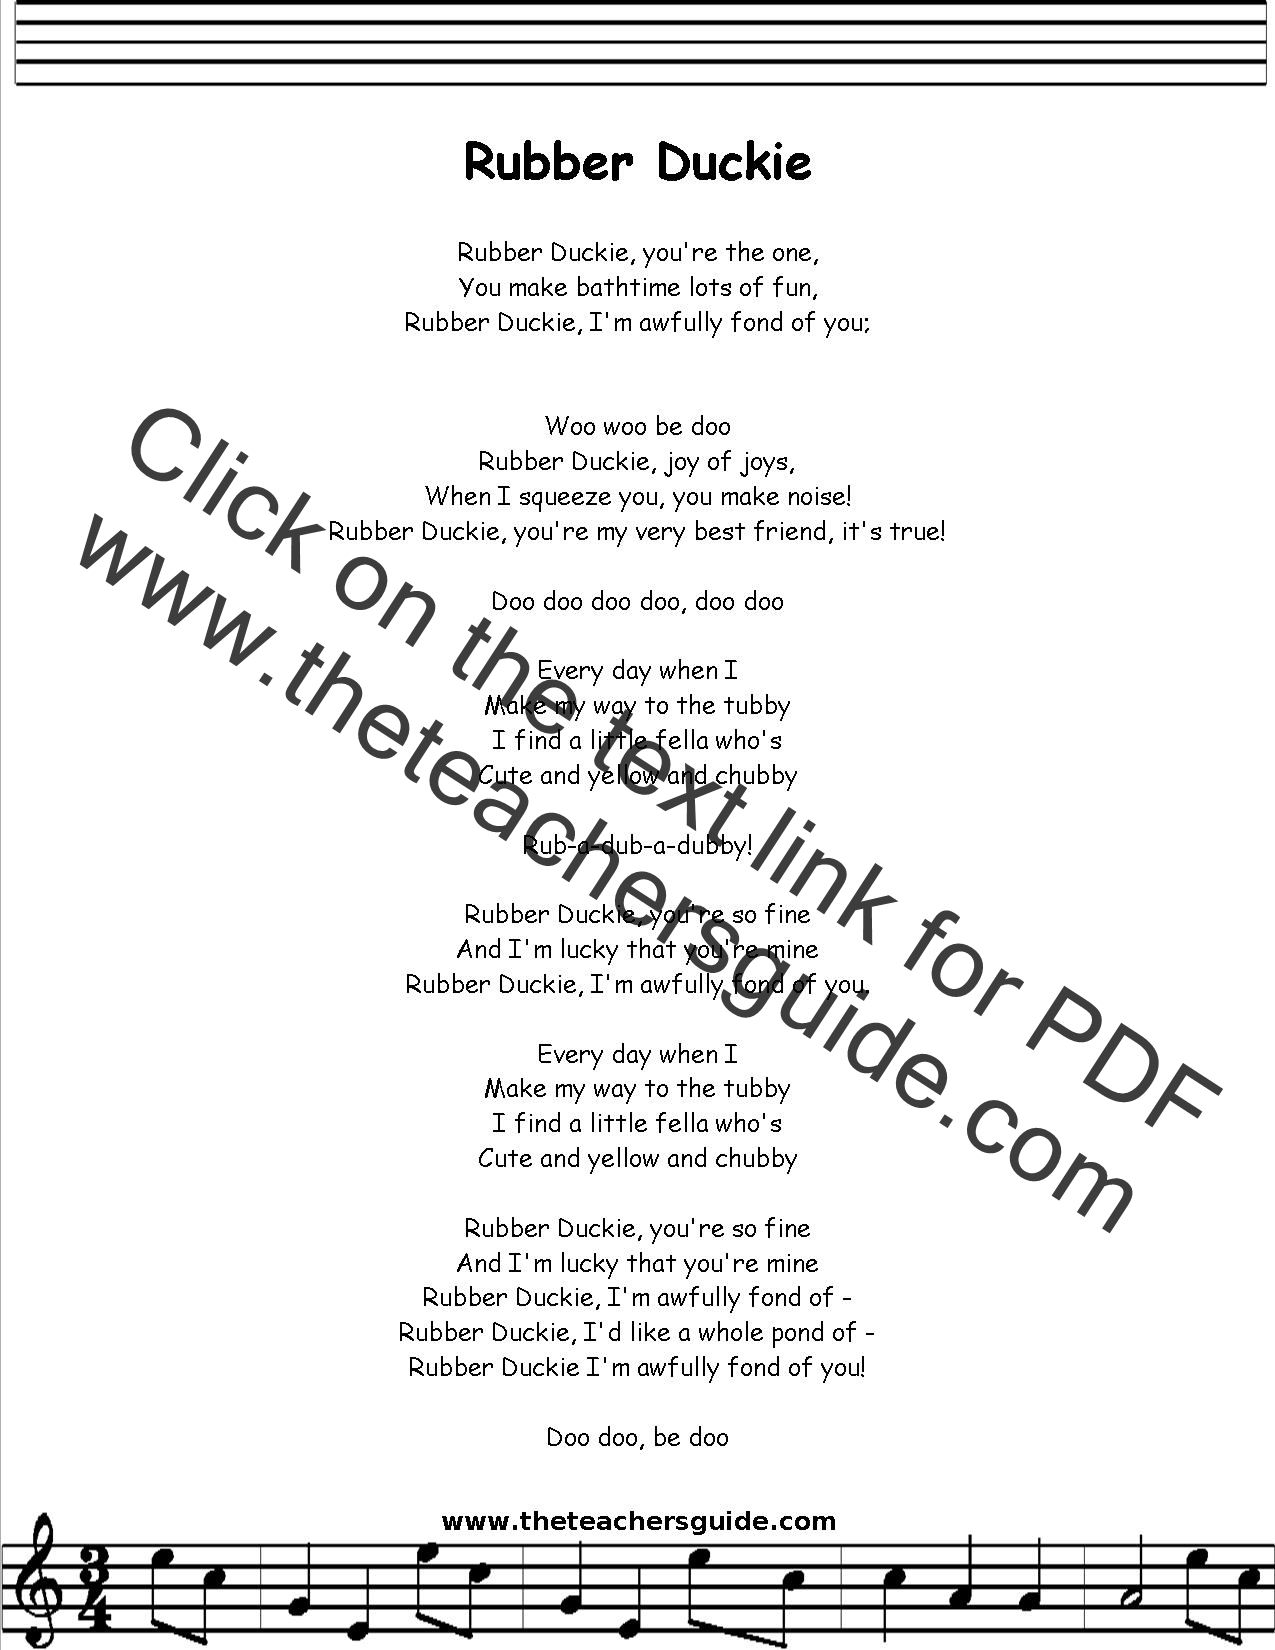 Rubber Duckie Lyrics Printout Midi And Video